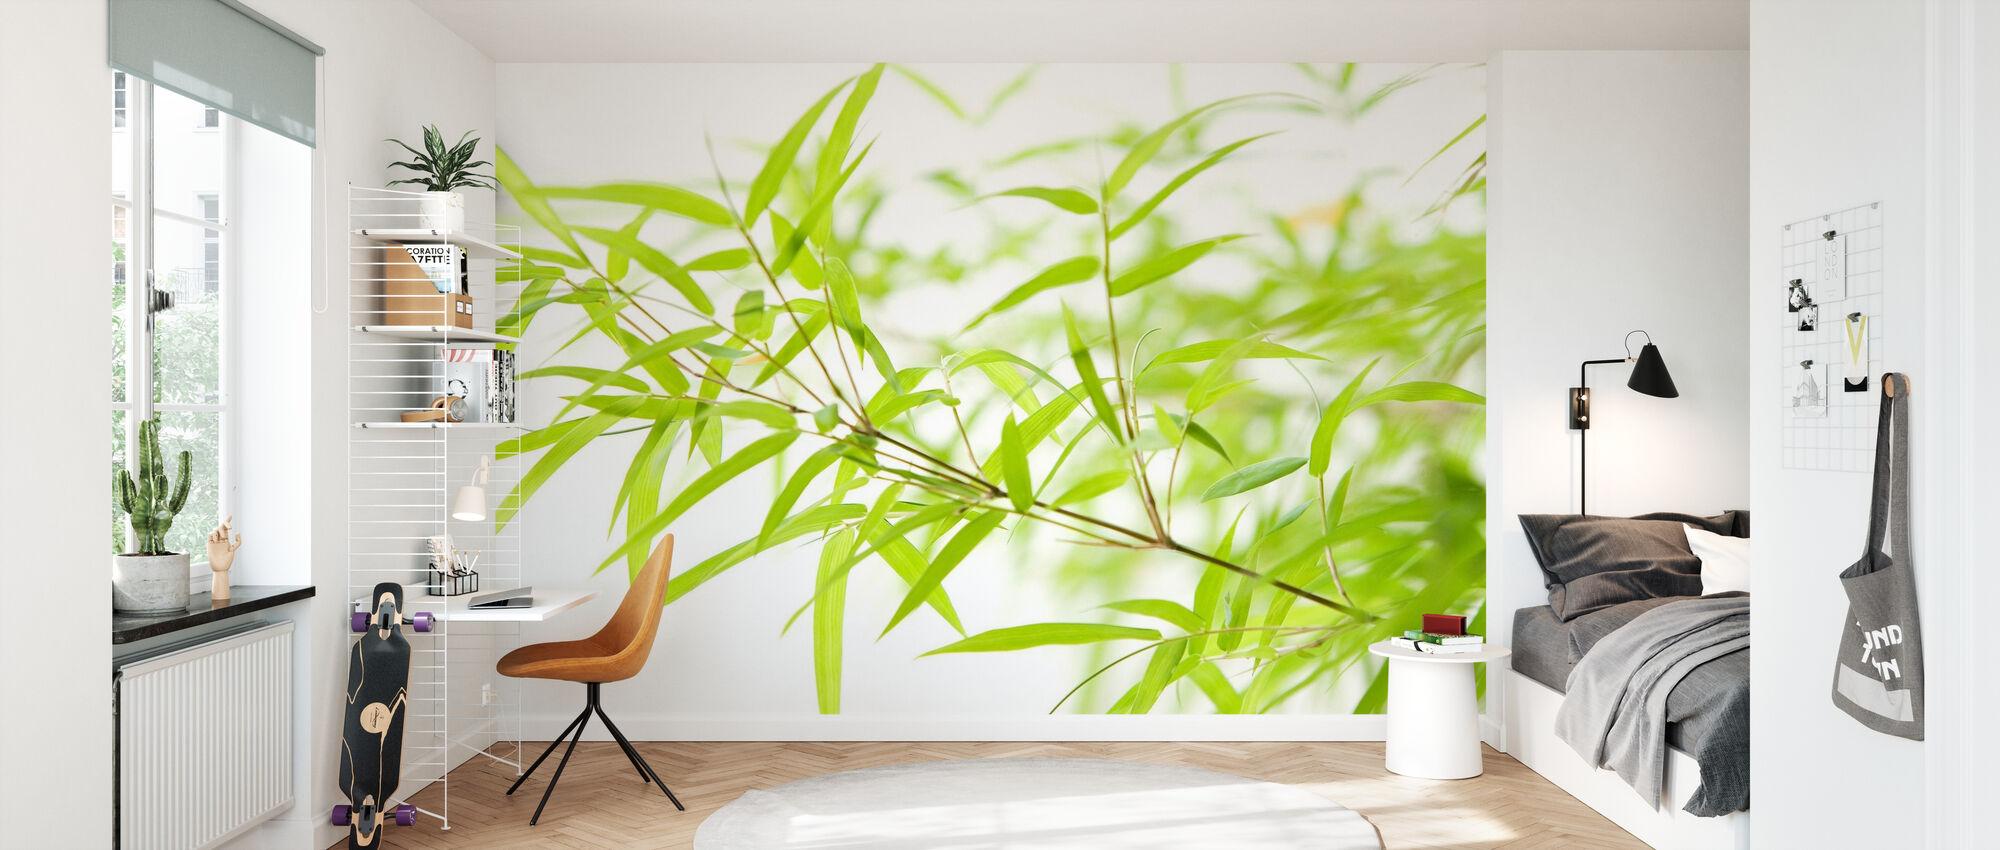 Miniatur-Bambus - Tapete - Kinderzimmer